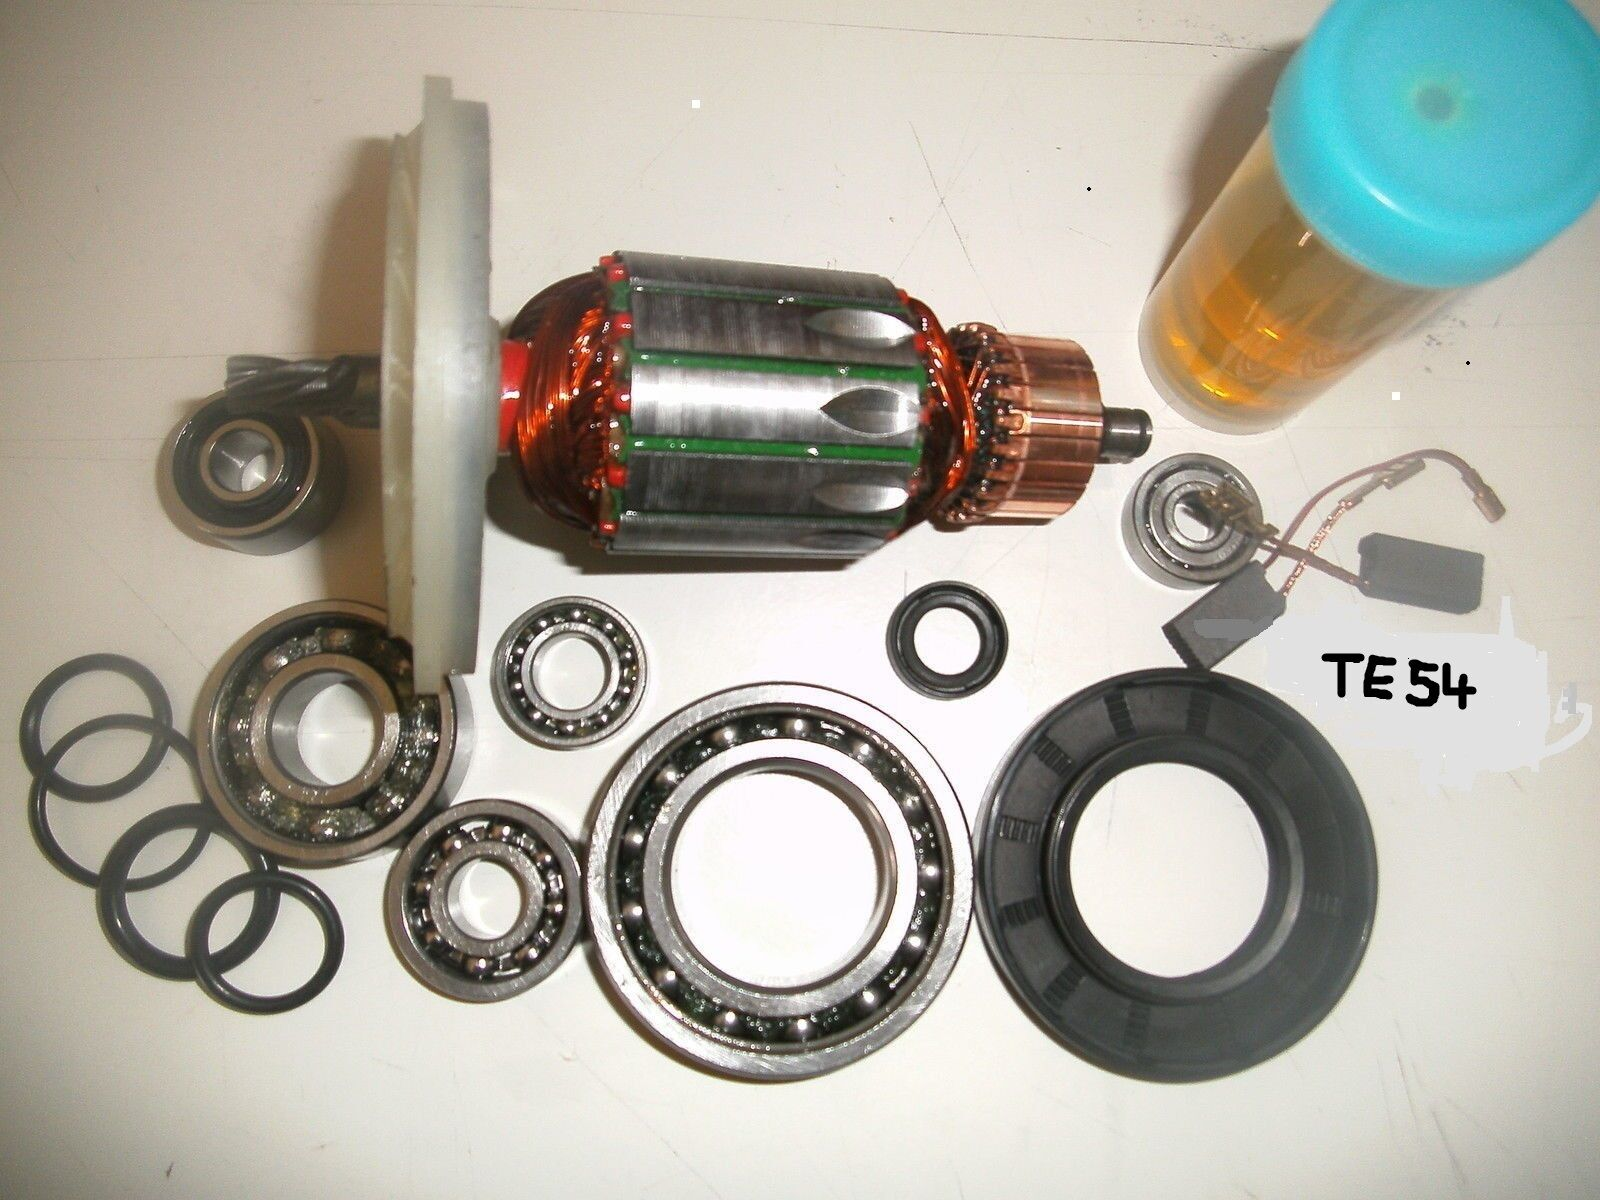 Hilti TE 54 Anker, Rotor und Reparatursatz komplett